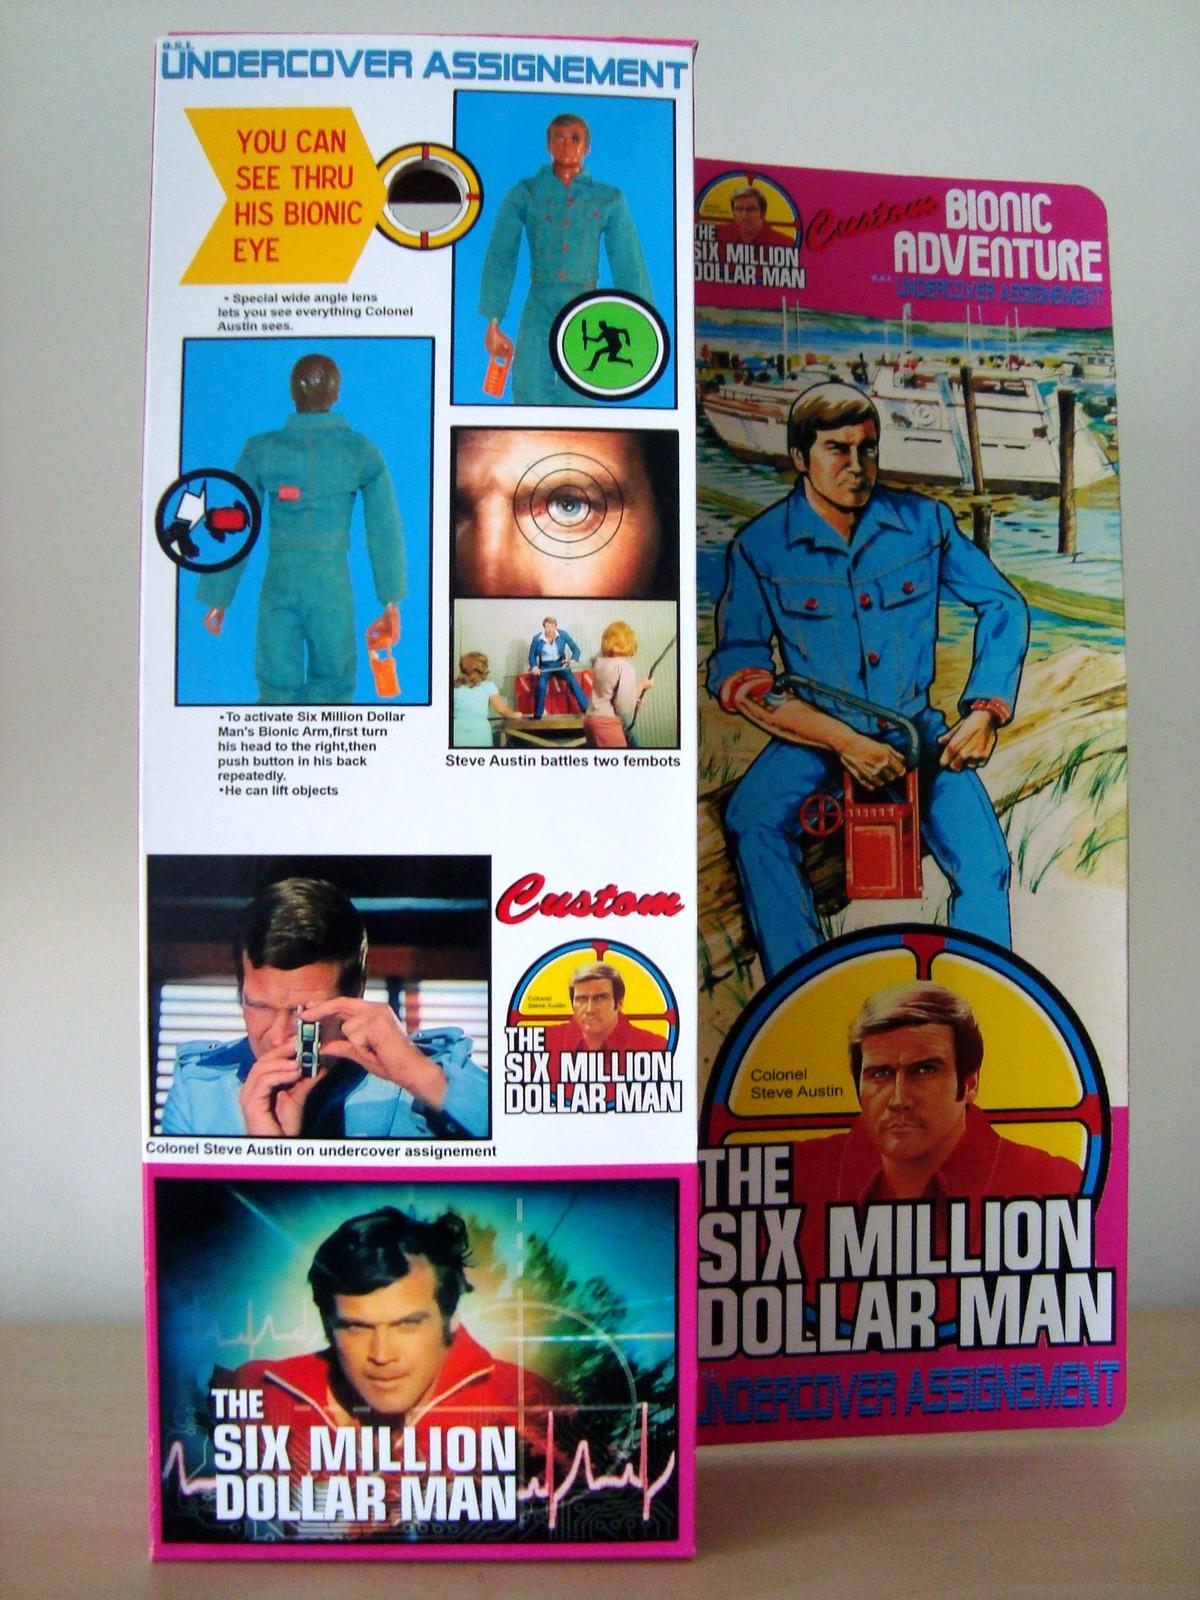 Steve Austin L'homme qui valait 3 milliards - KENNER MECCANO - Page 11 170629071250965665